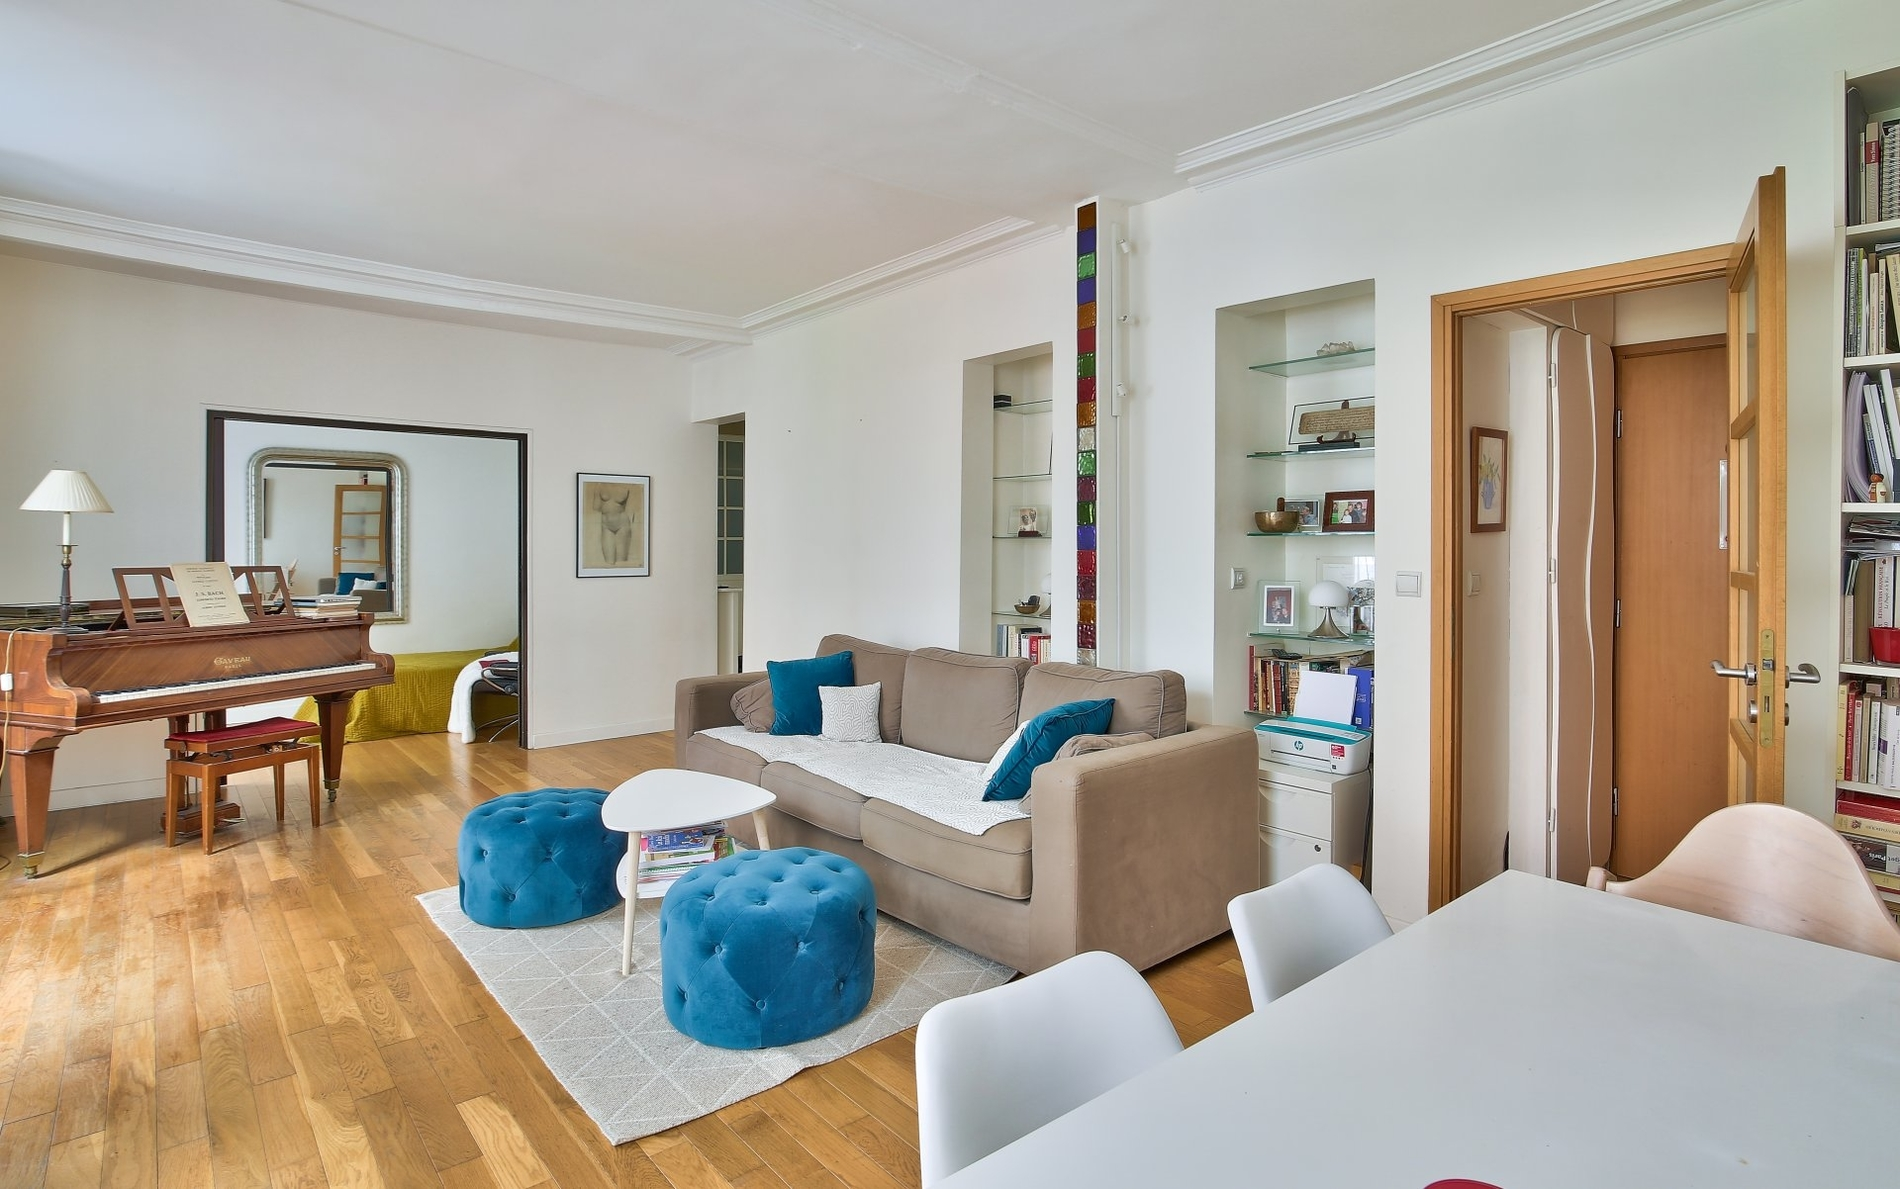 beautiful-south-facing-family-apartment-for-sale-highly-popular-neighbourhood-cellar